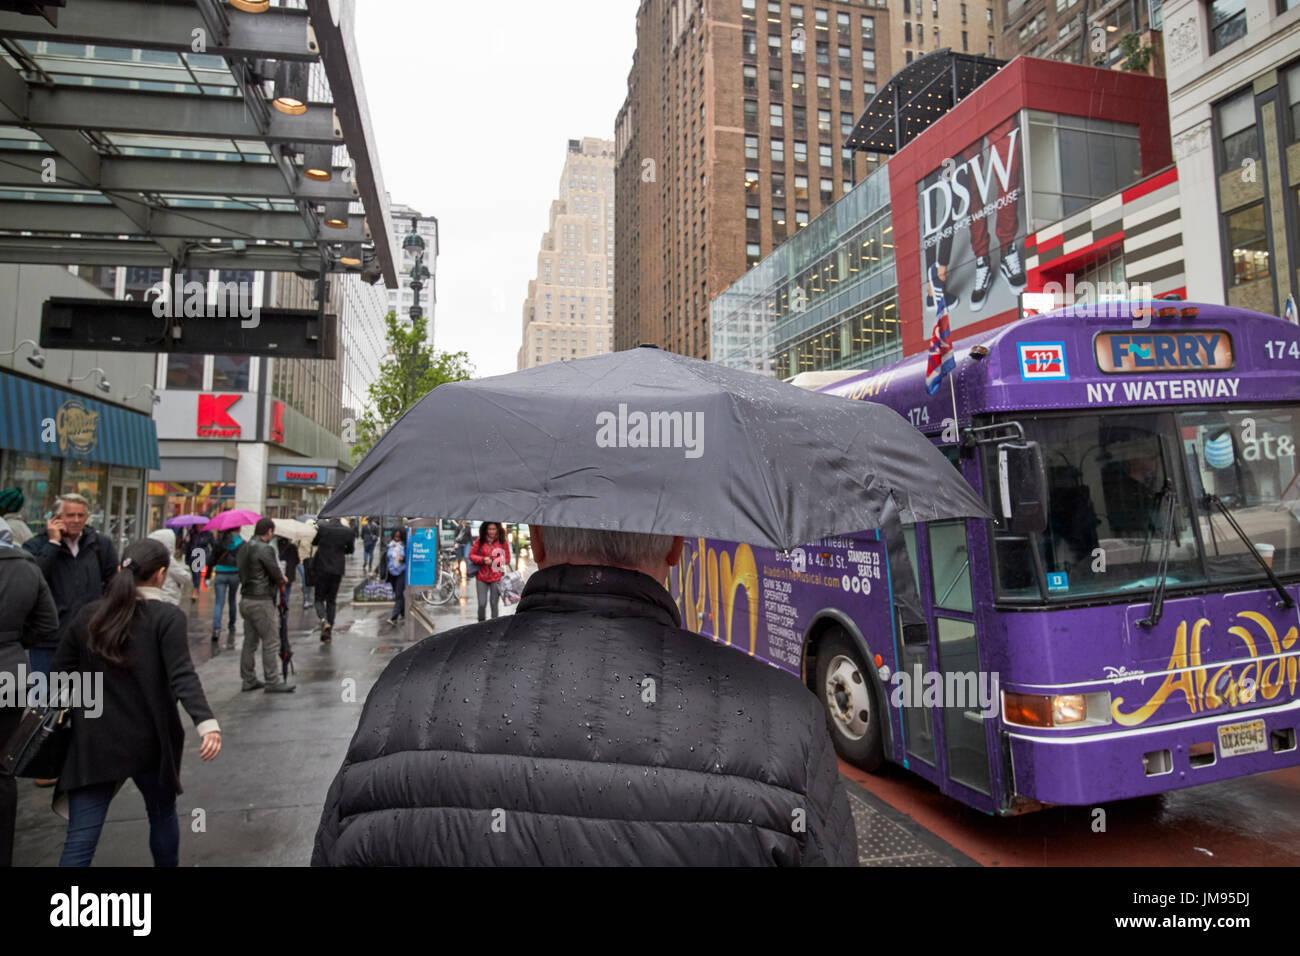 man city wet street stock photos man city wet street stock images alamy. Black Bedroom Furniture Sets. Home Design Ideas